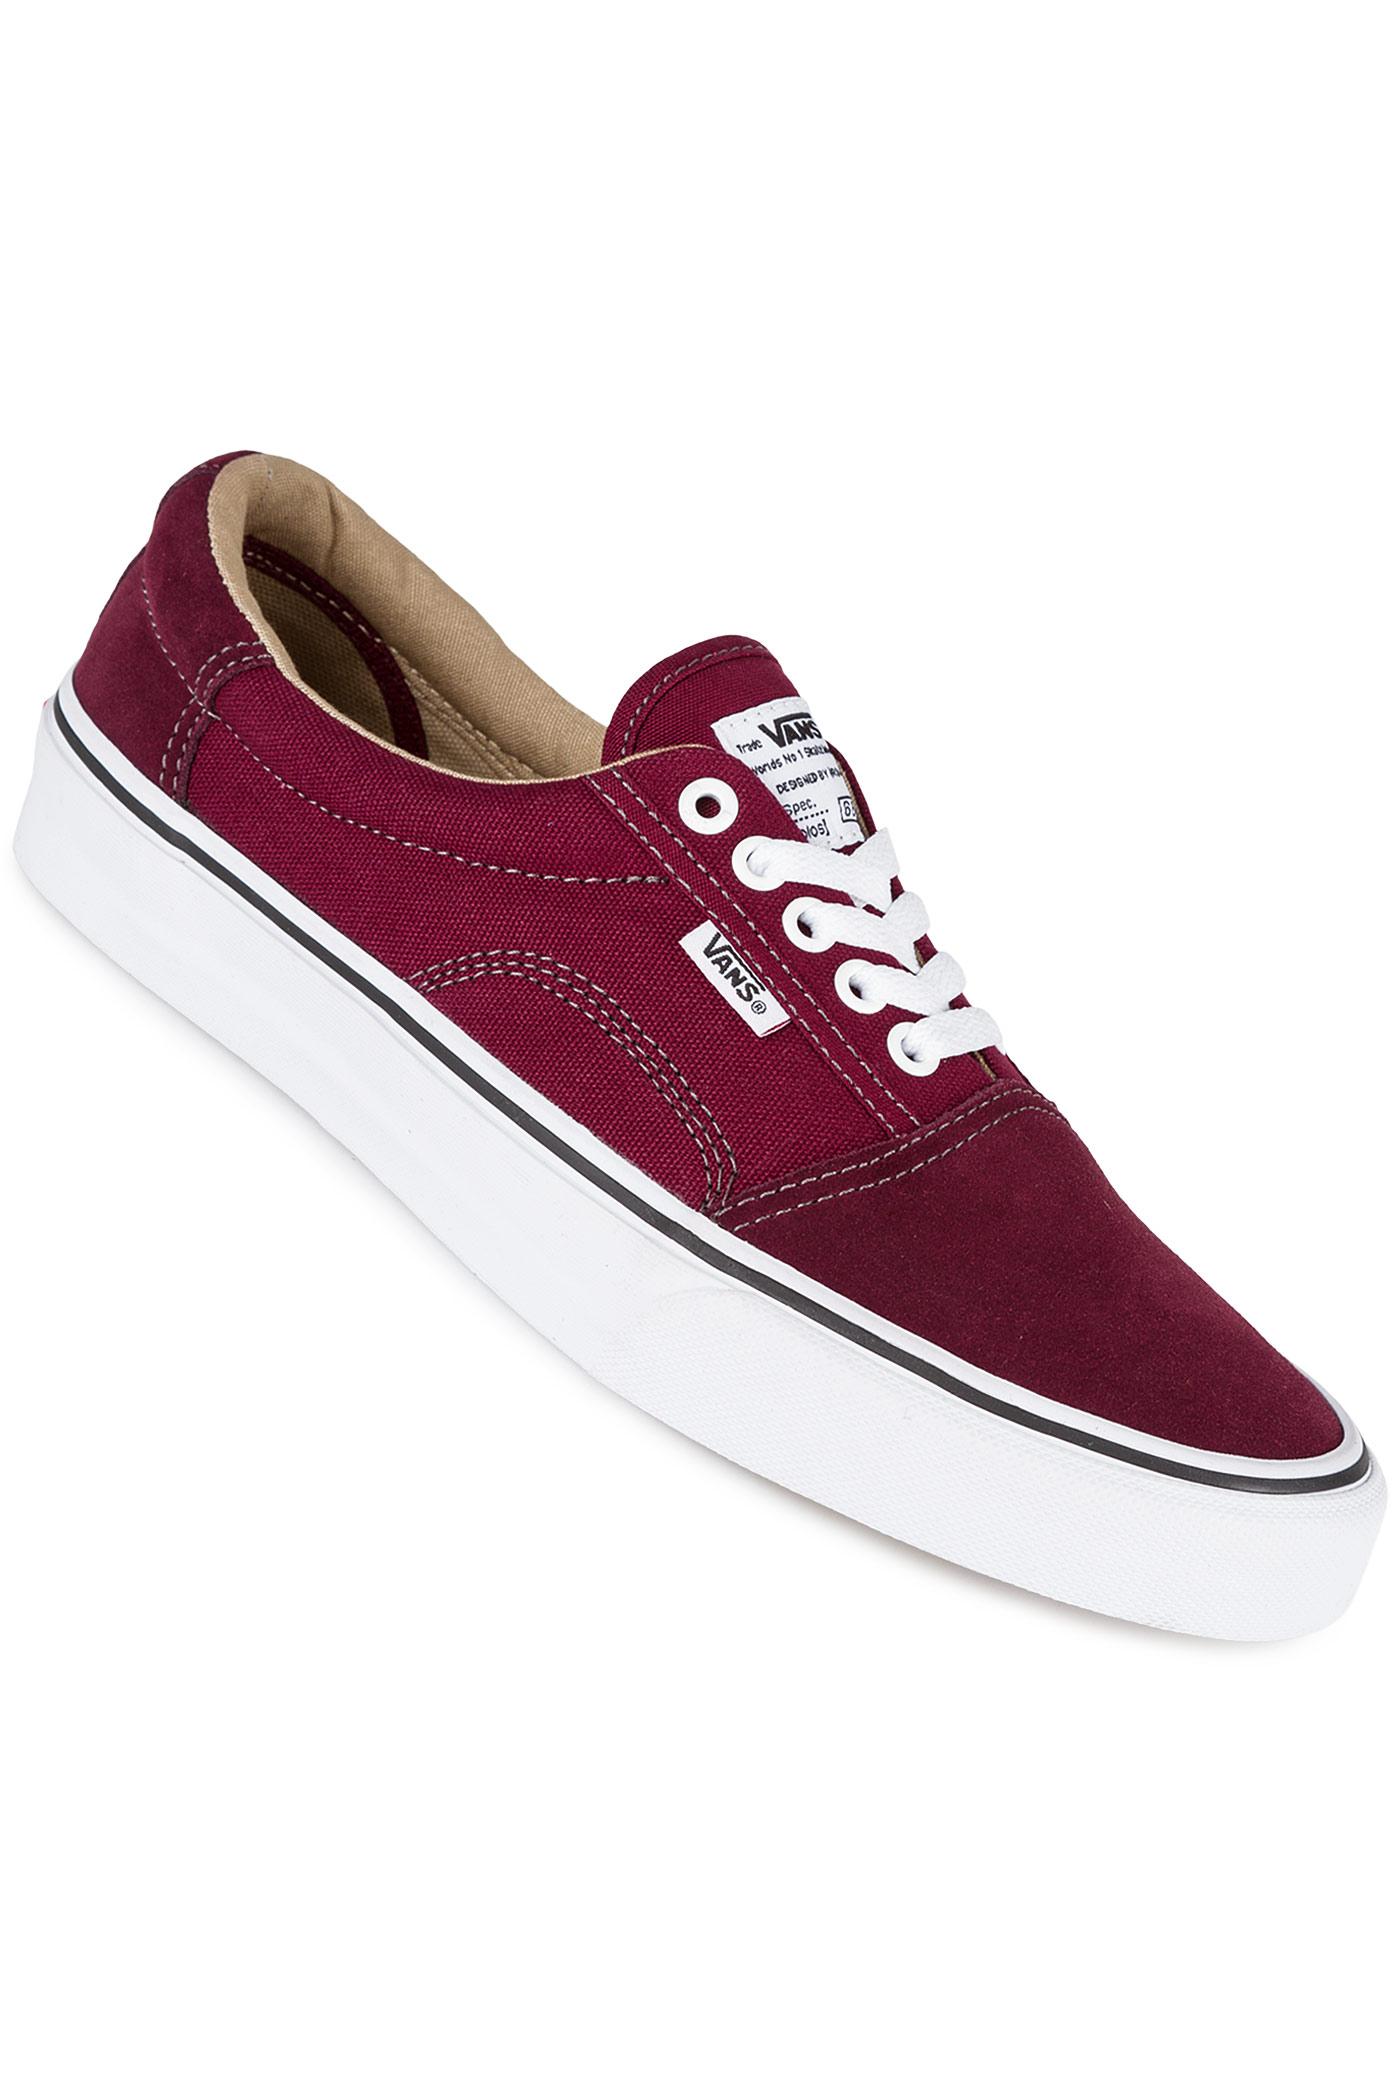 9764c8b008 Vans Rowley Solos Shoe (port royale white) buy at skatedeluxe